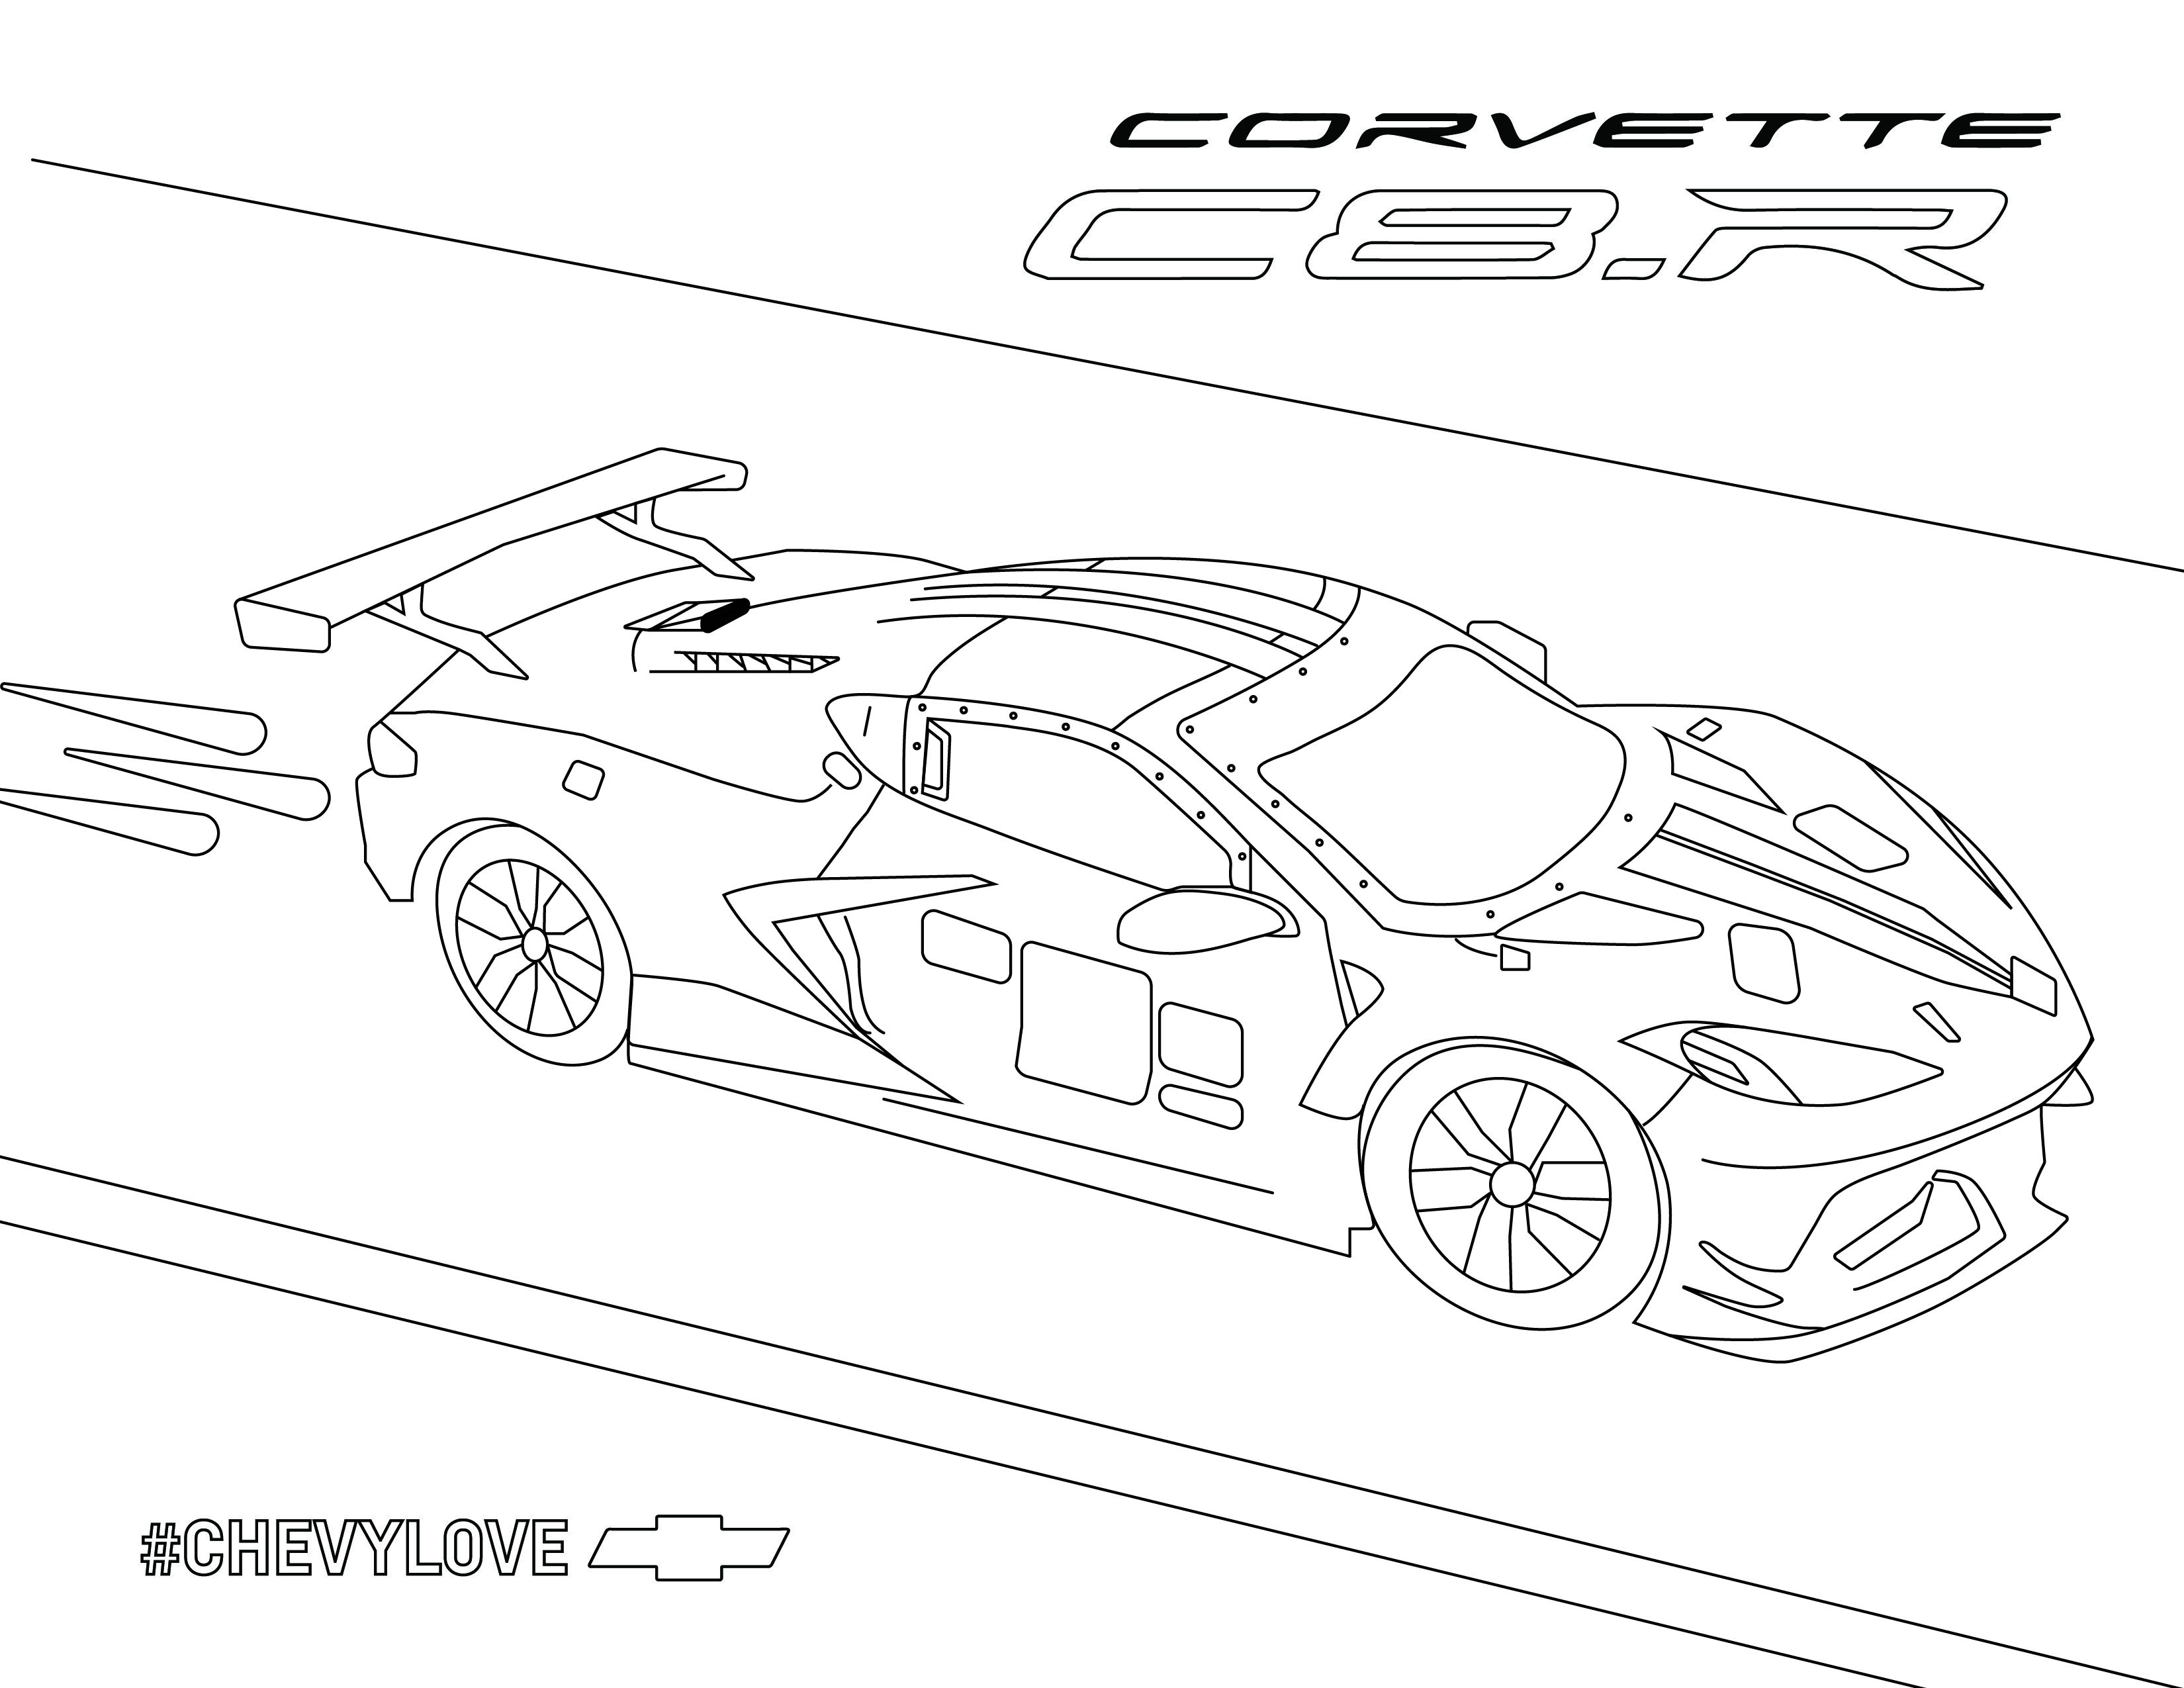 Corvette C8 R In 2020 Chevy Silverado Hd Coloring Books Car Activities